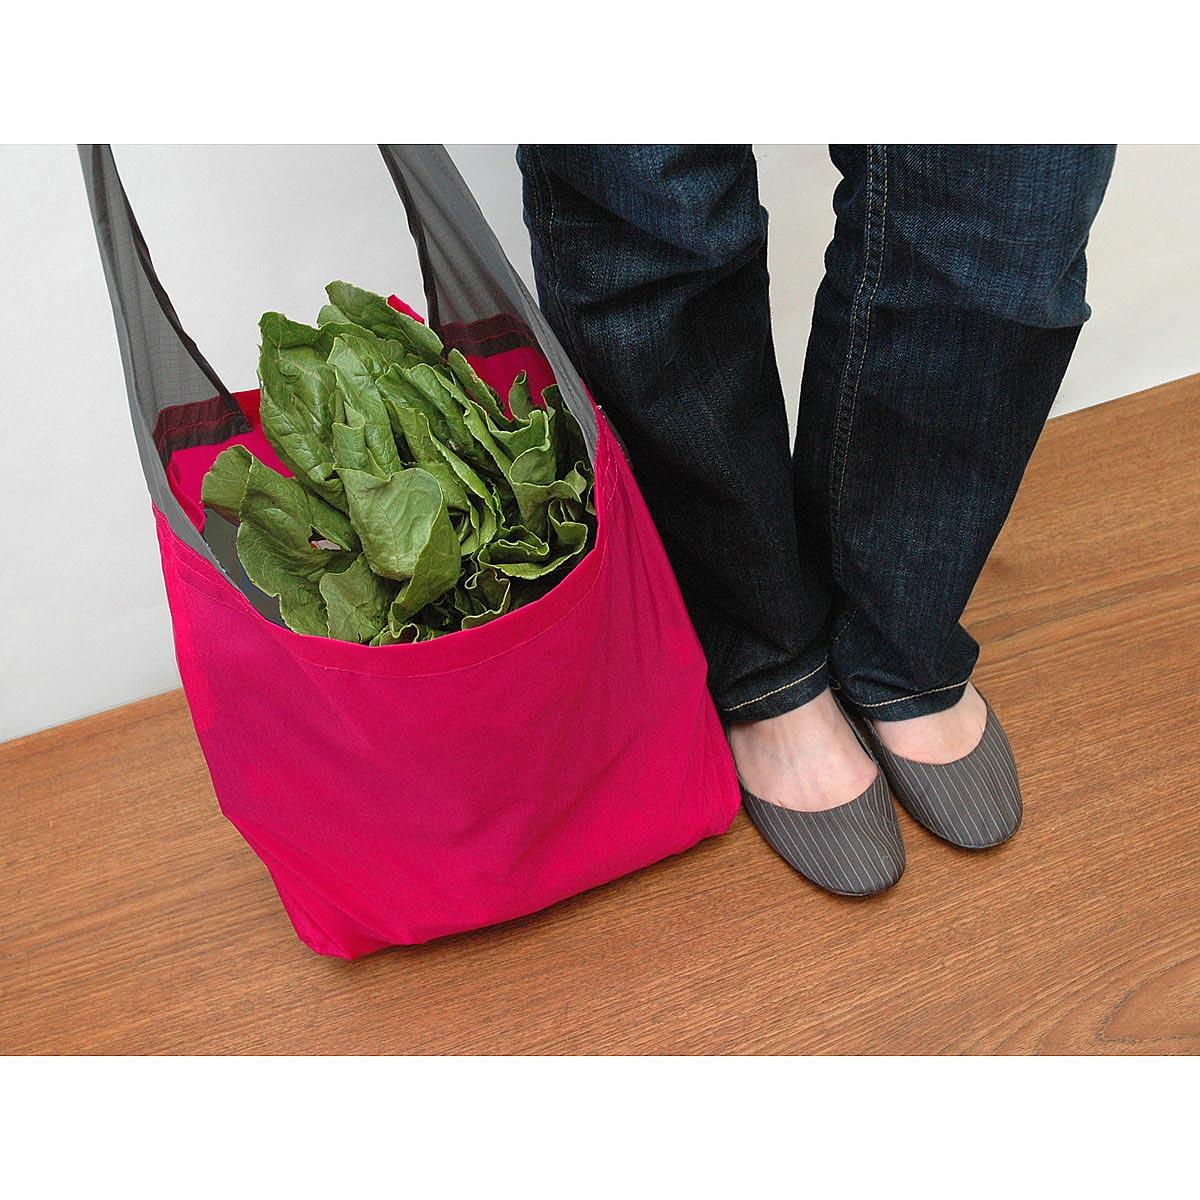 Flip & Tumble Reusable Shopping Bags | reusable grocery bag, nylon ...